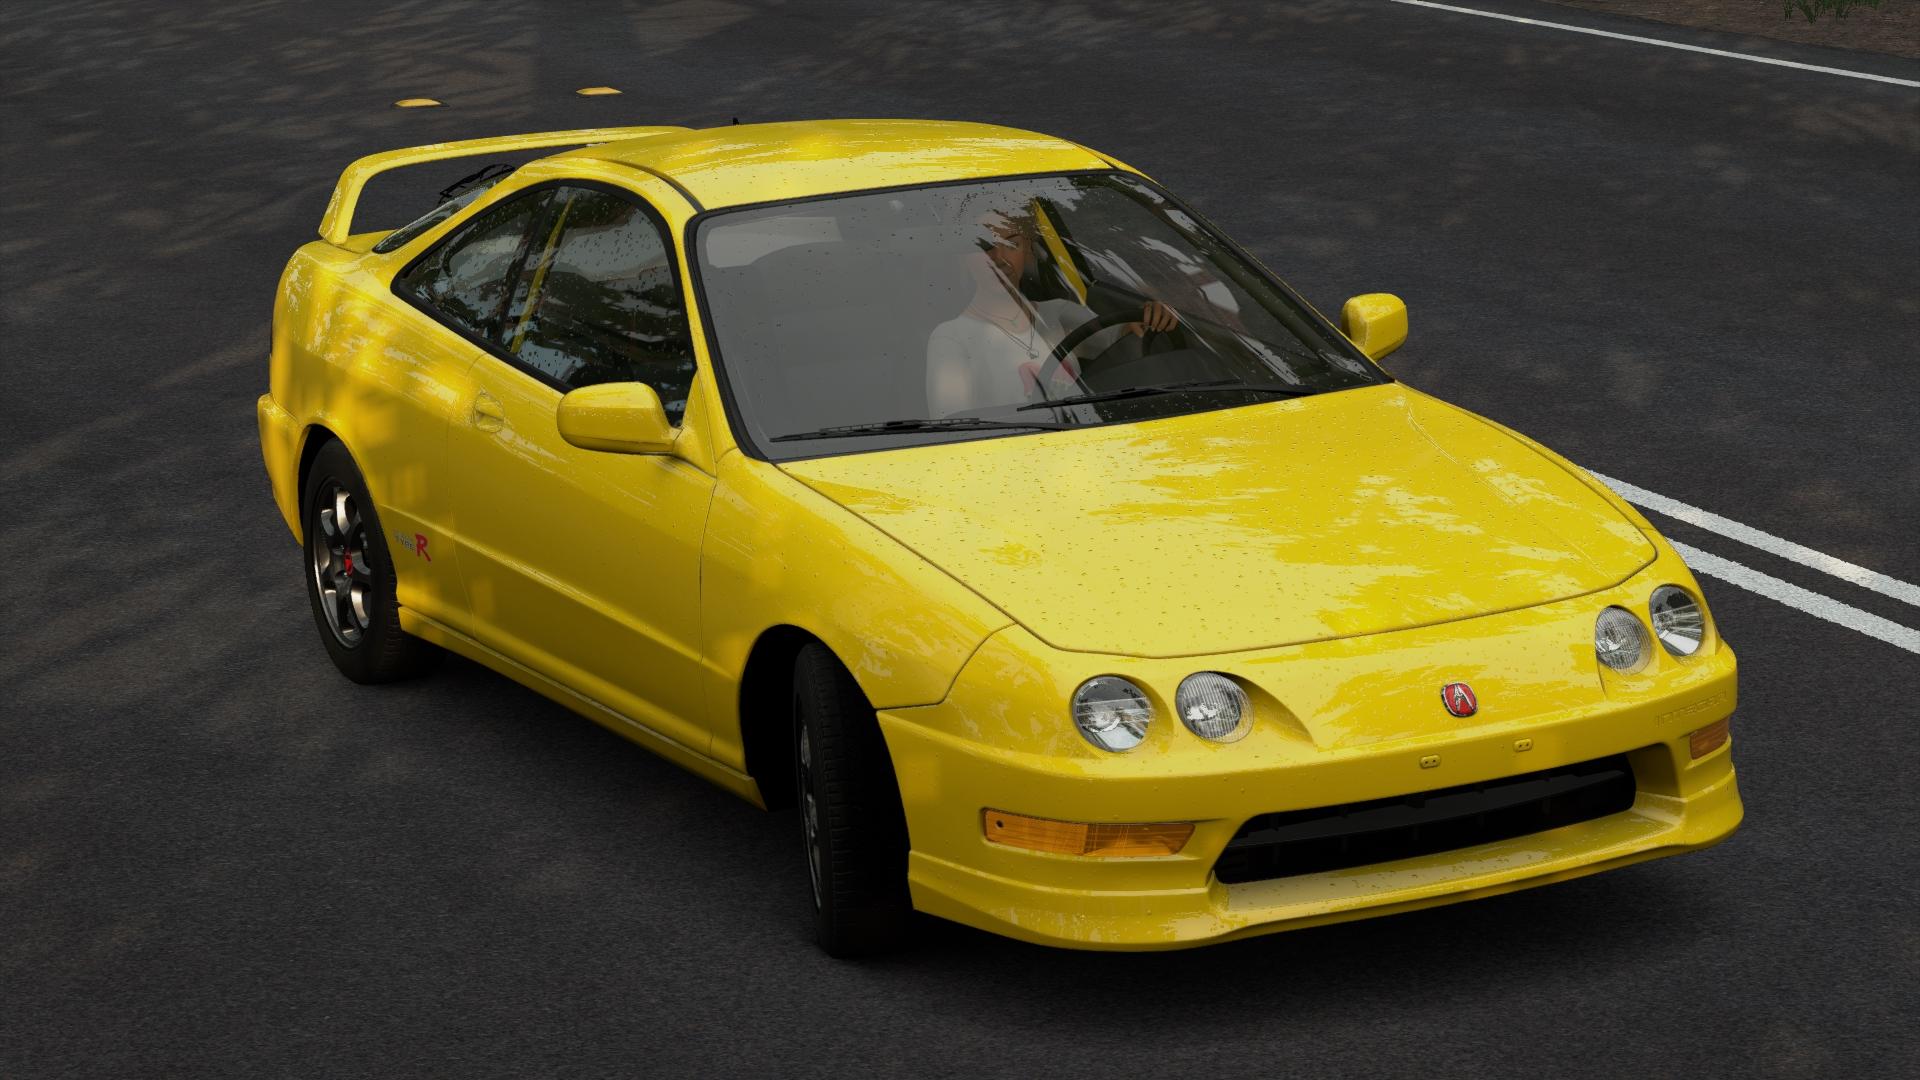 Latest Cb on 2000 Honda Accord Jdm Magazine